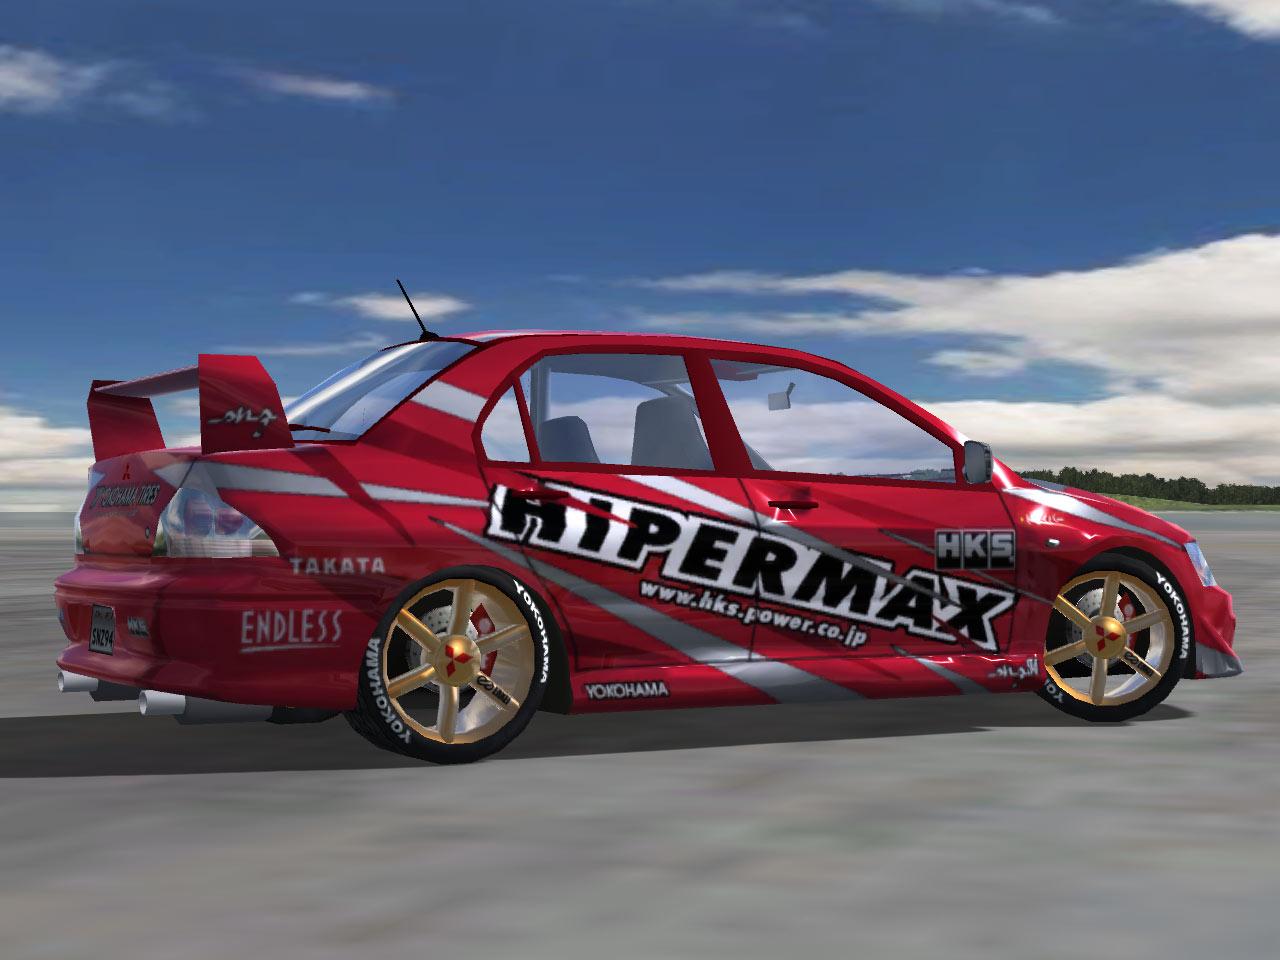 trackmania carpark • 2d skins • lancer evo-drift hks